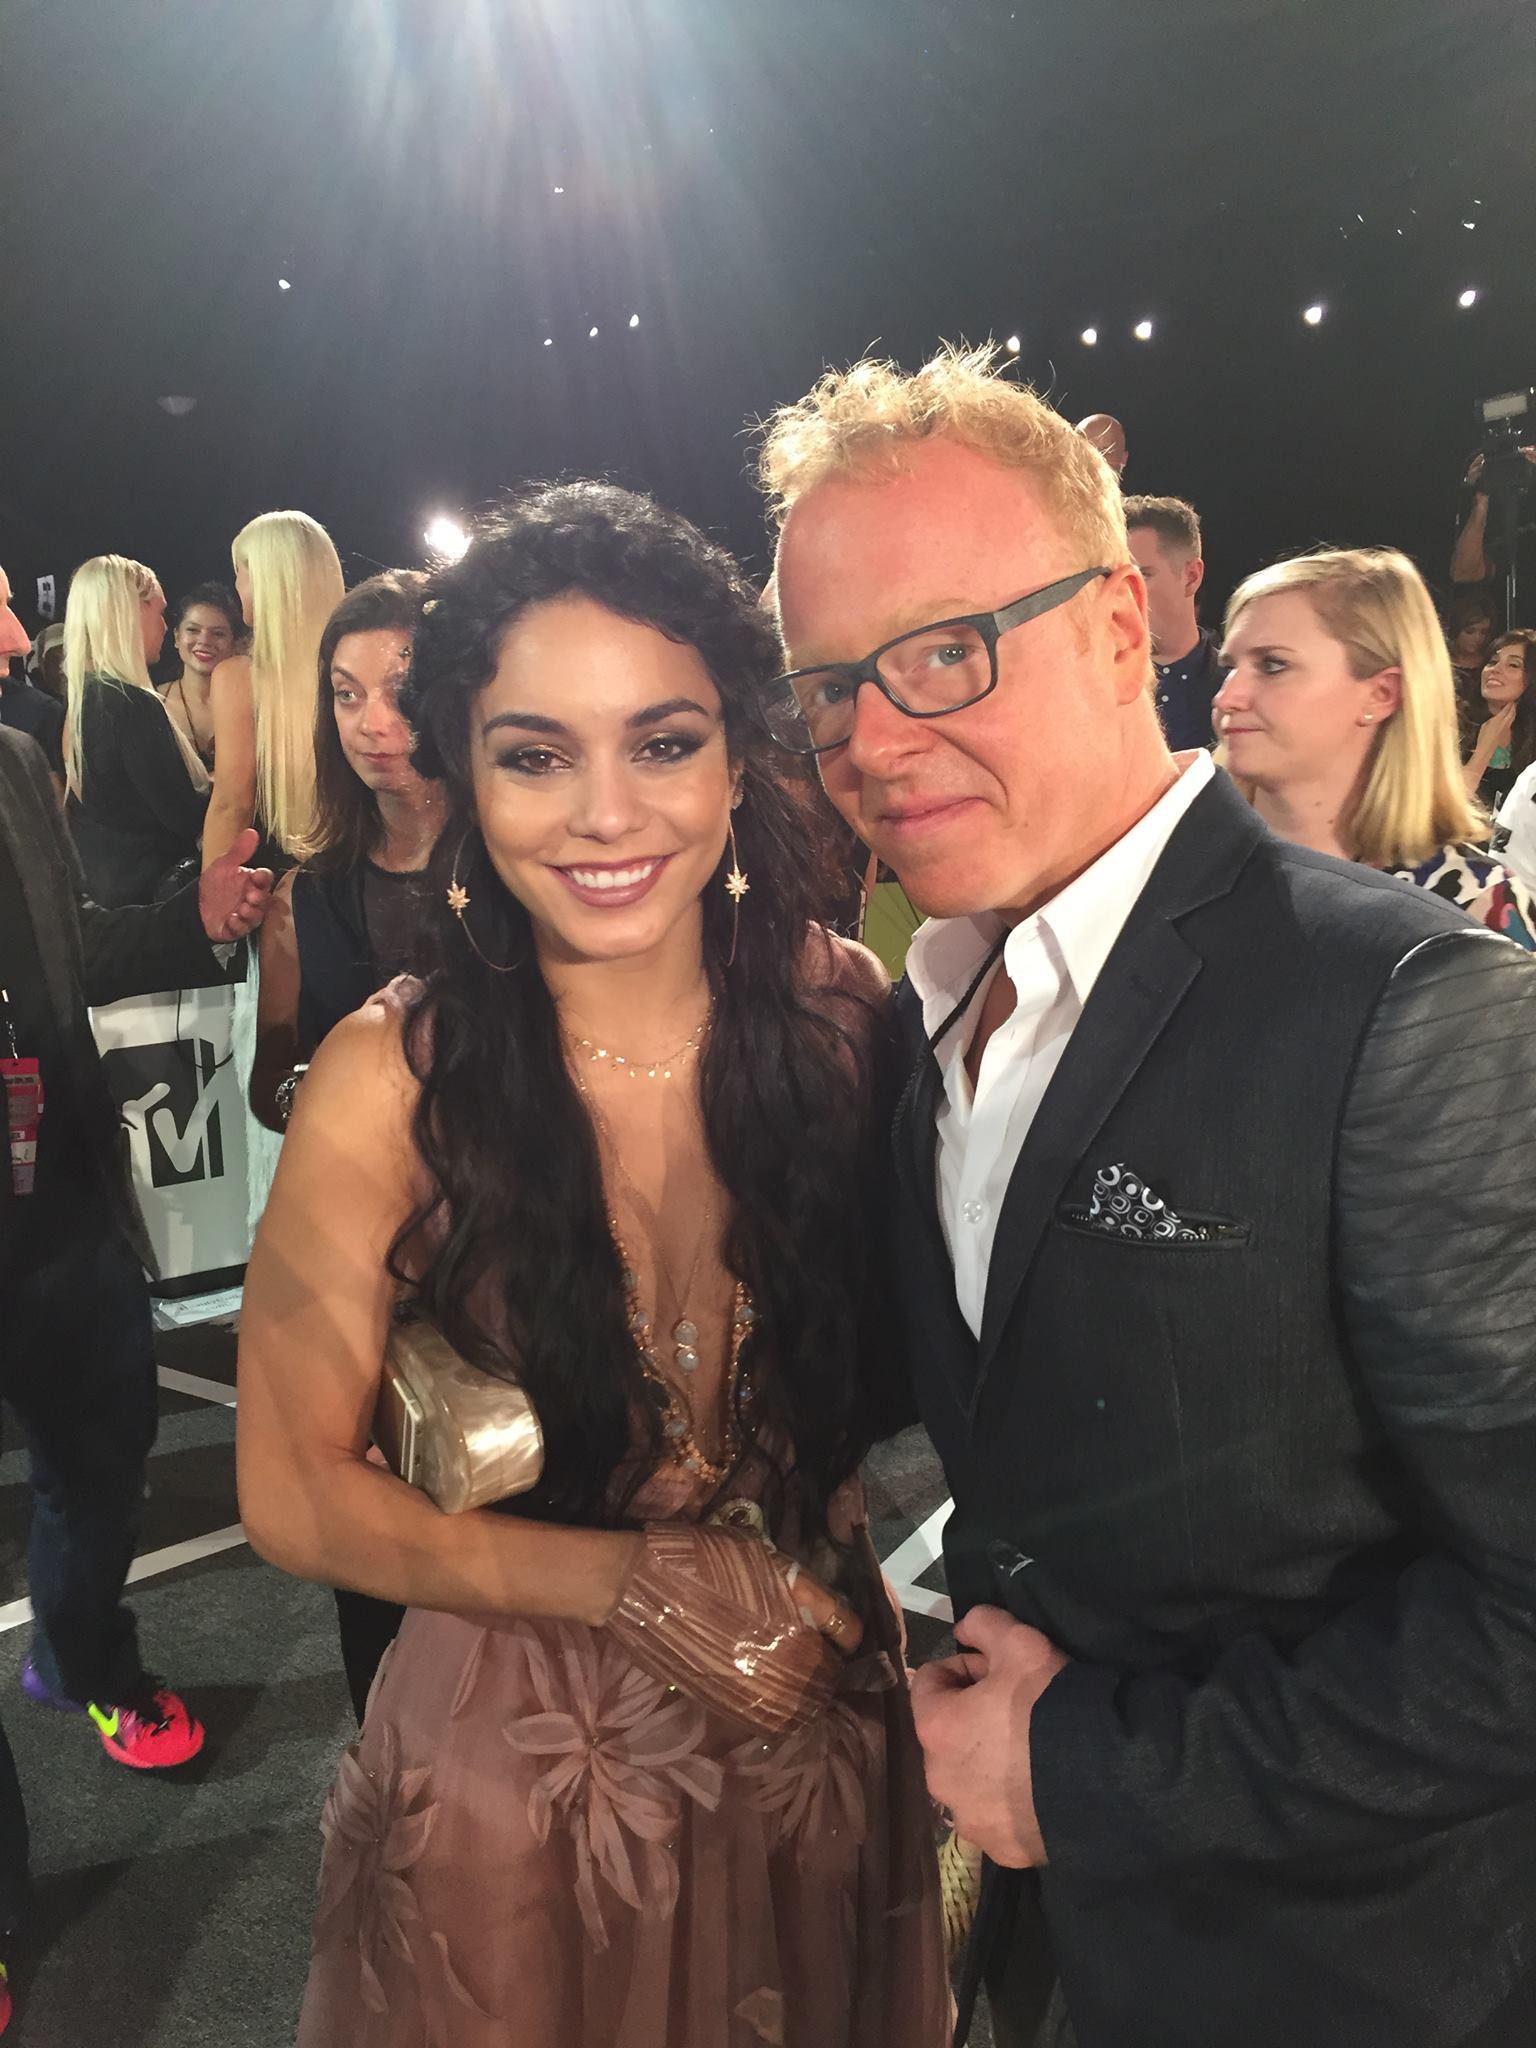 Chris Young attends MTV Music Awards alongside music artists Kourtney Kelly and Vanessa Hudgens